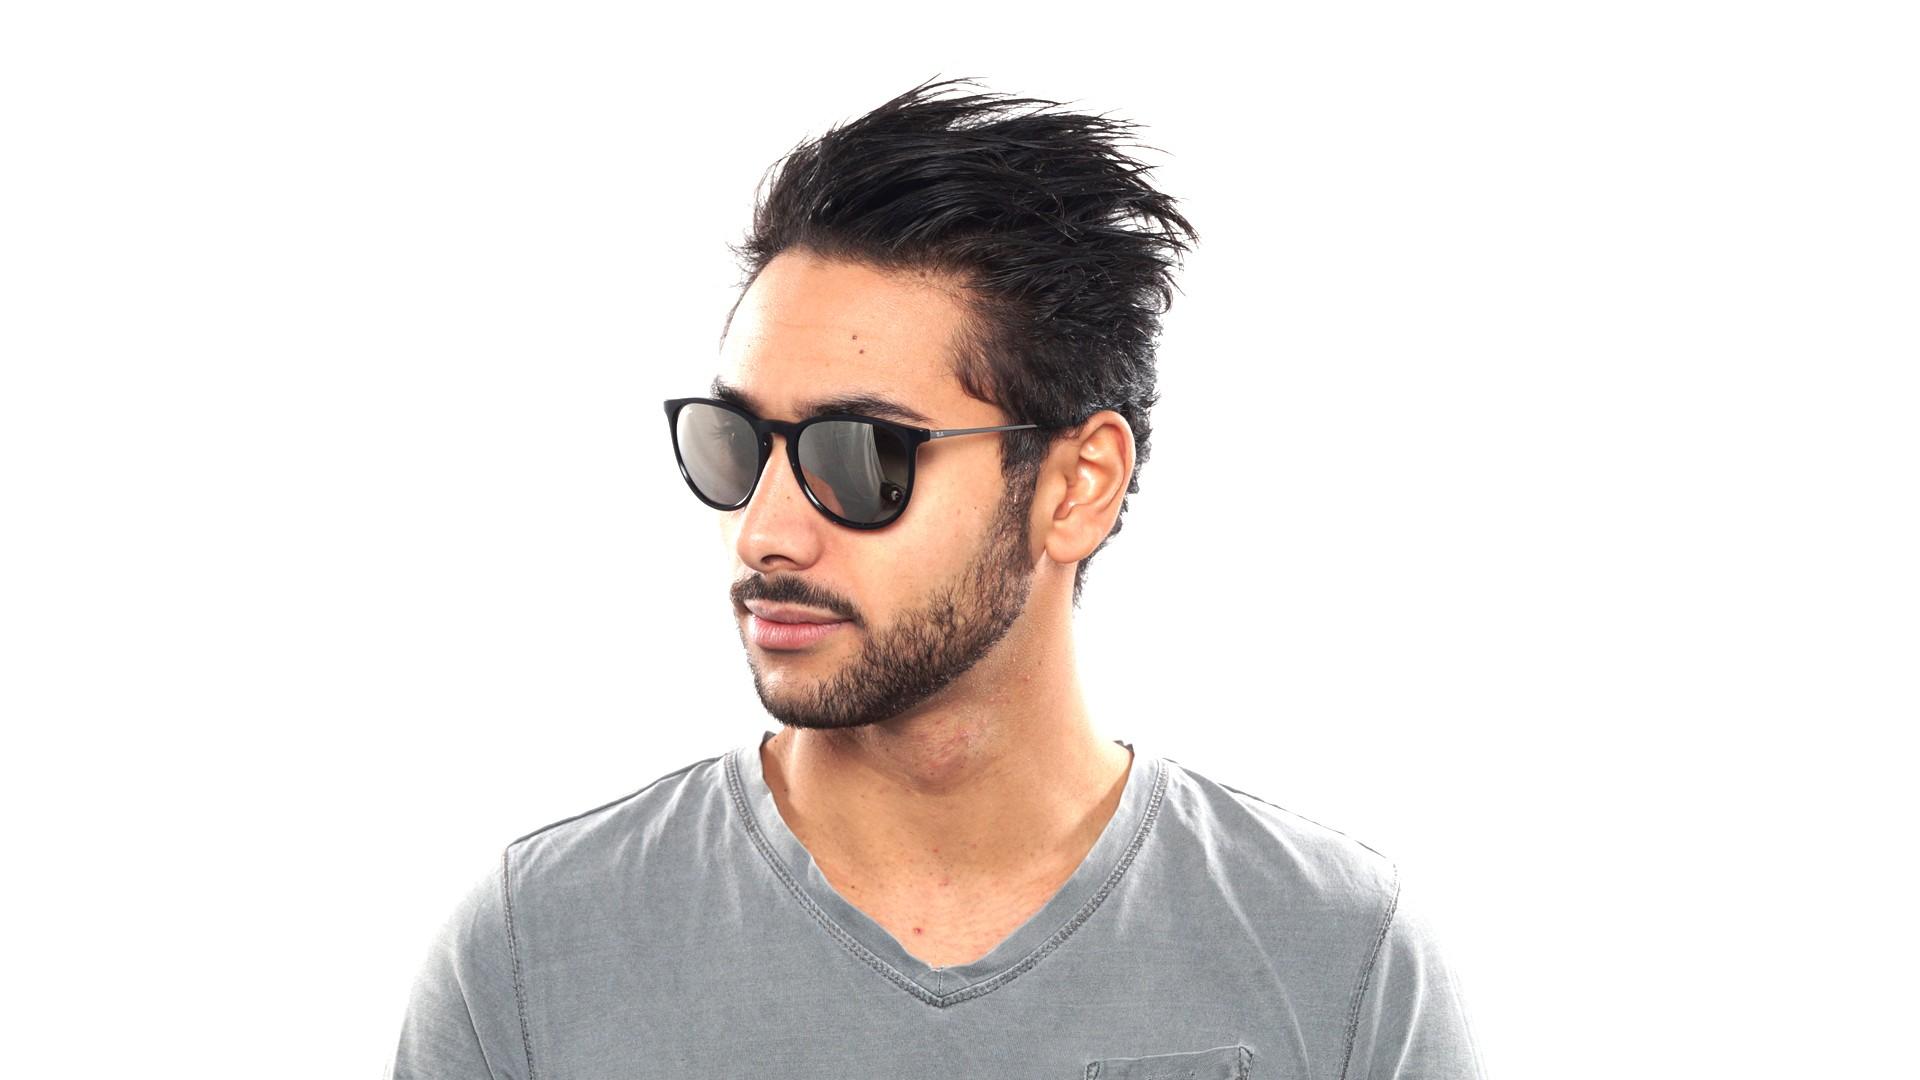 601b99e565e57 Sunglasses Ray-Ban Erika Black RB4171 601 5A 54-18 Medium Mirror